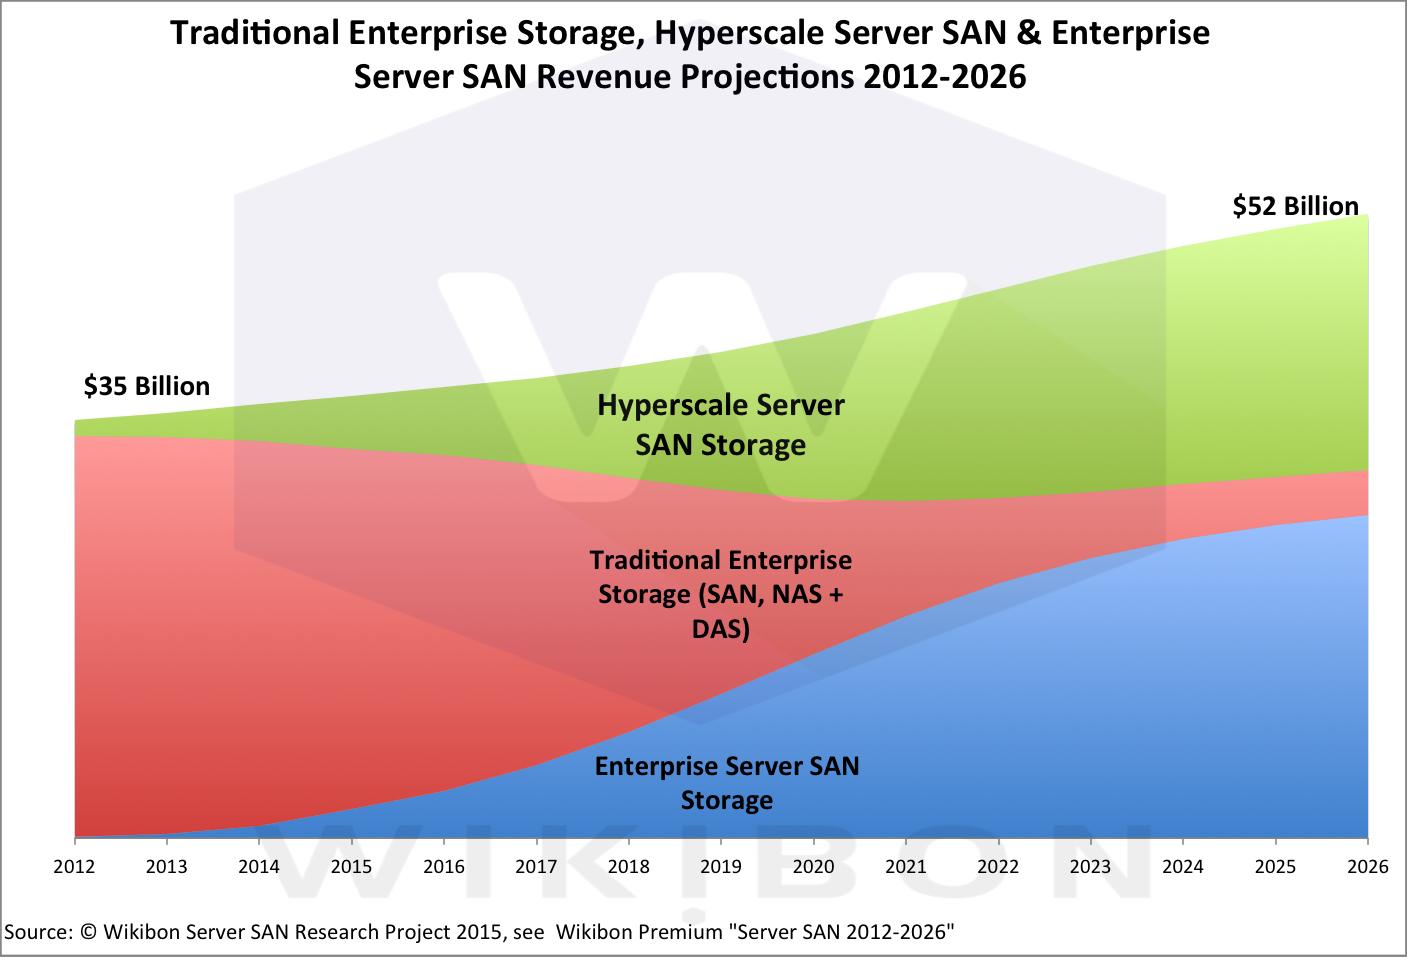 Server SAN 2012-2026 Forecast Source: Wikibon 2015